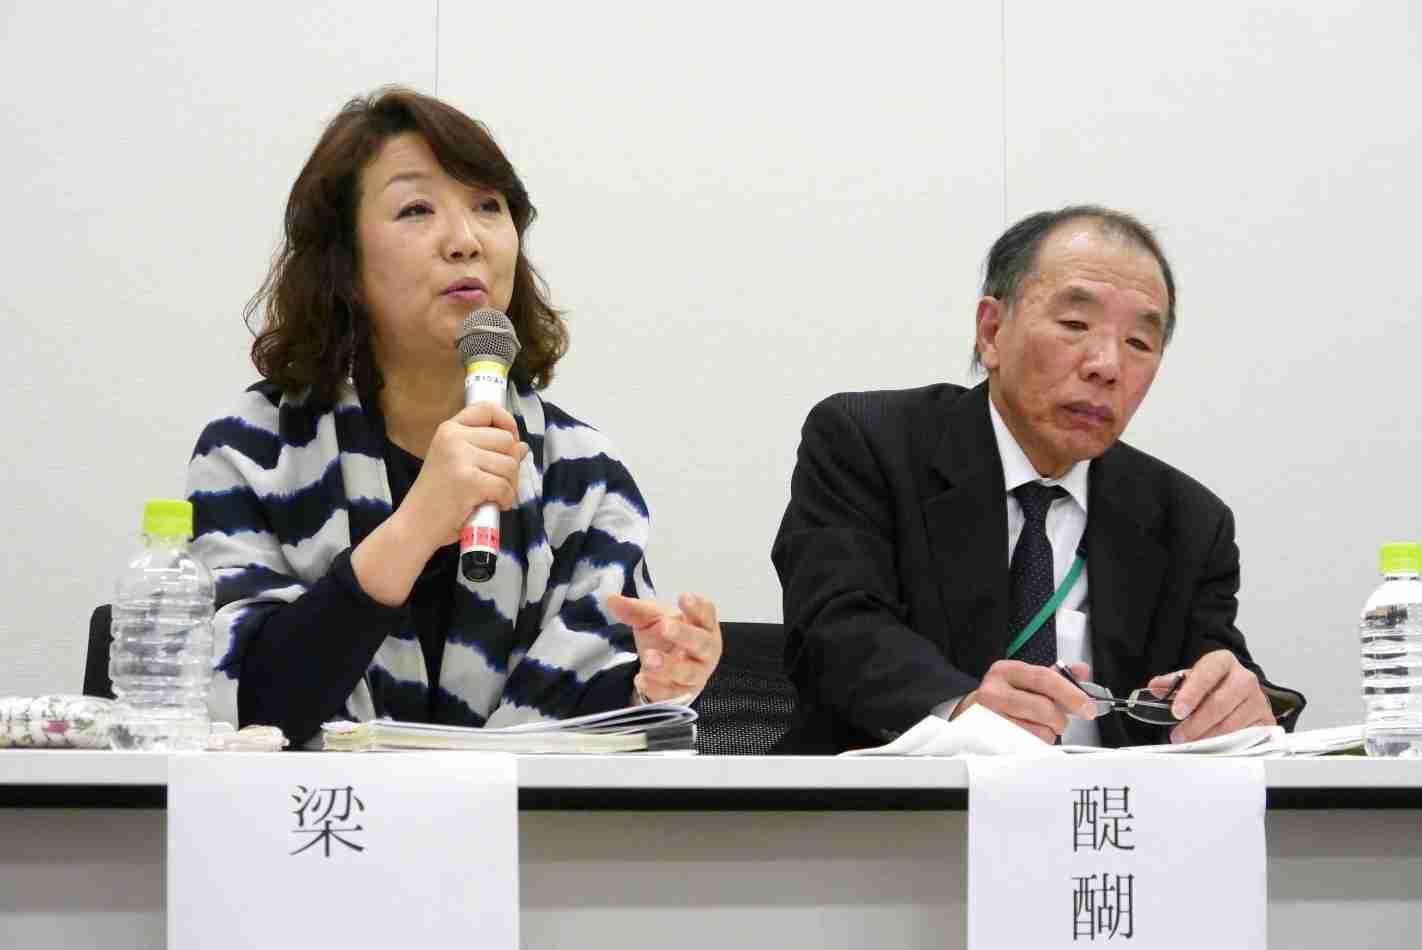 NHK「クローズアップ現代プラス」――「少女像」報道に抗議 (週刊金曜日) - Yahoo!ニュース